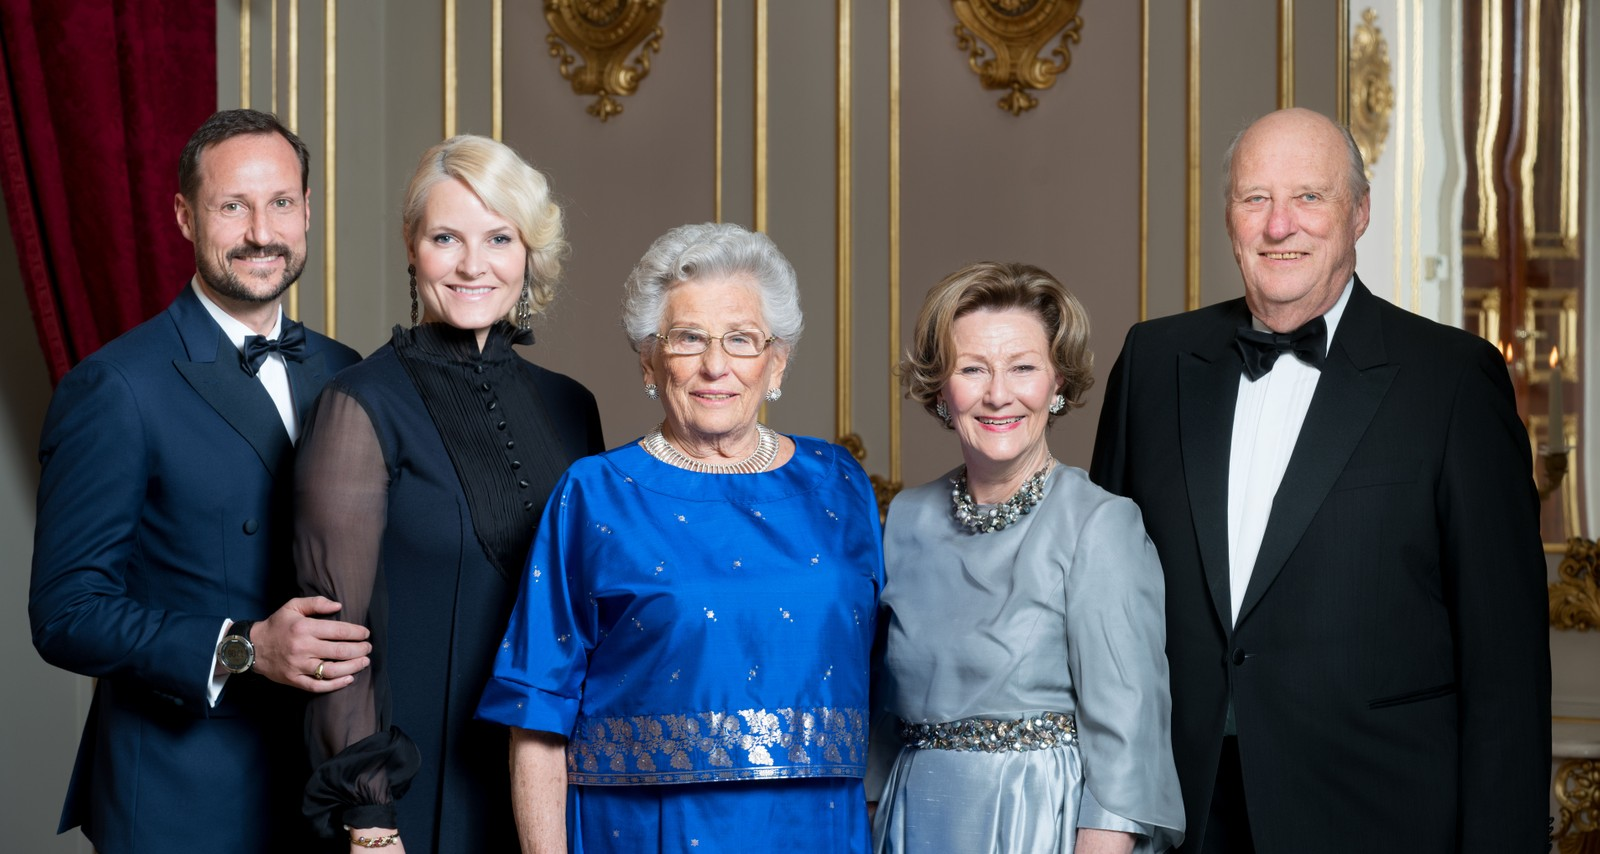 Prinsesse Astrid (midten) sammen med f.v. kronprins Haakon, kronprinsesse Mette-Marit, dronning Sonja og kong Harald på Slottet i Oslo fredag, i forbindelse med at kongeparet holdt en middag for prinsessen i anledning hennes 85-årsdag 12. februar 2017.